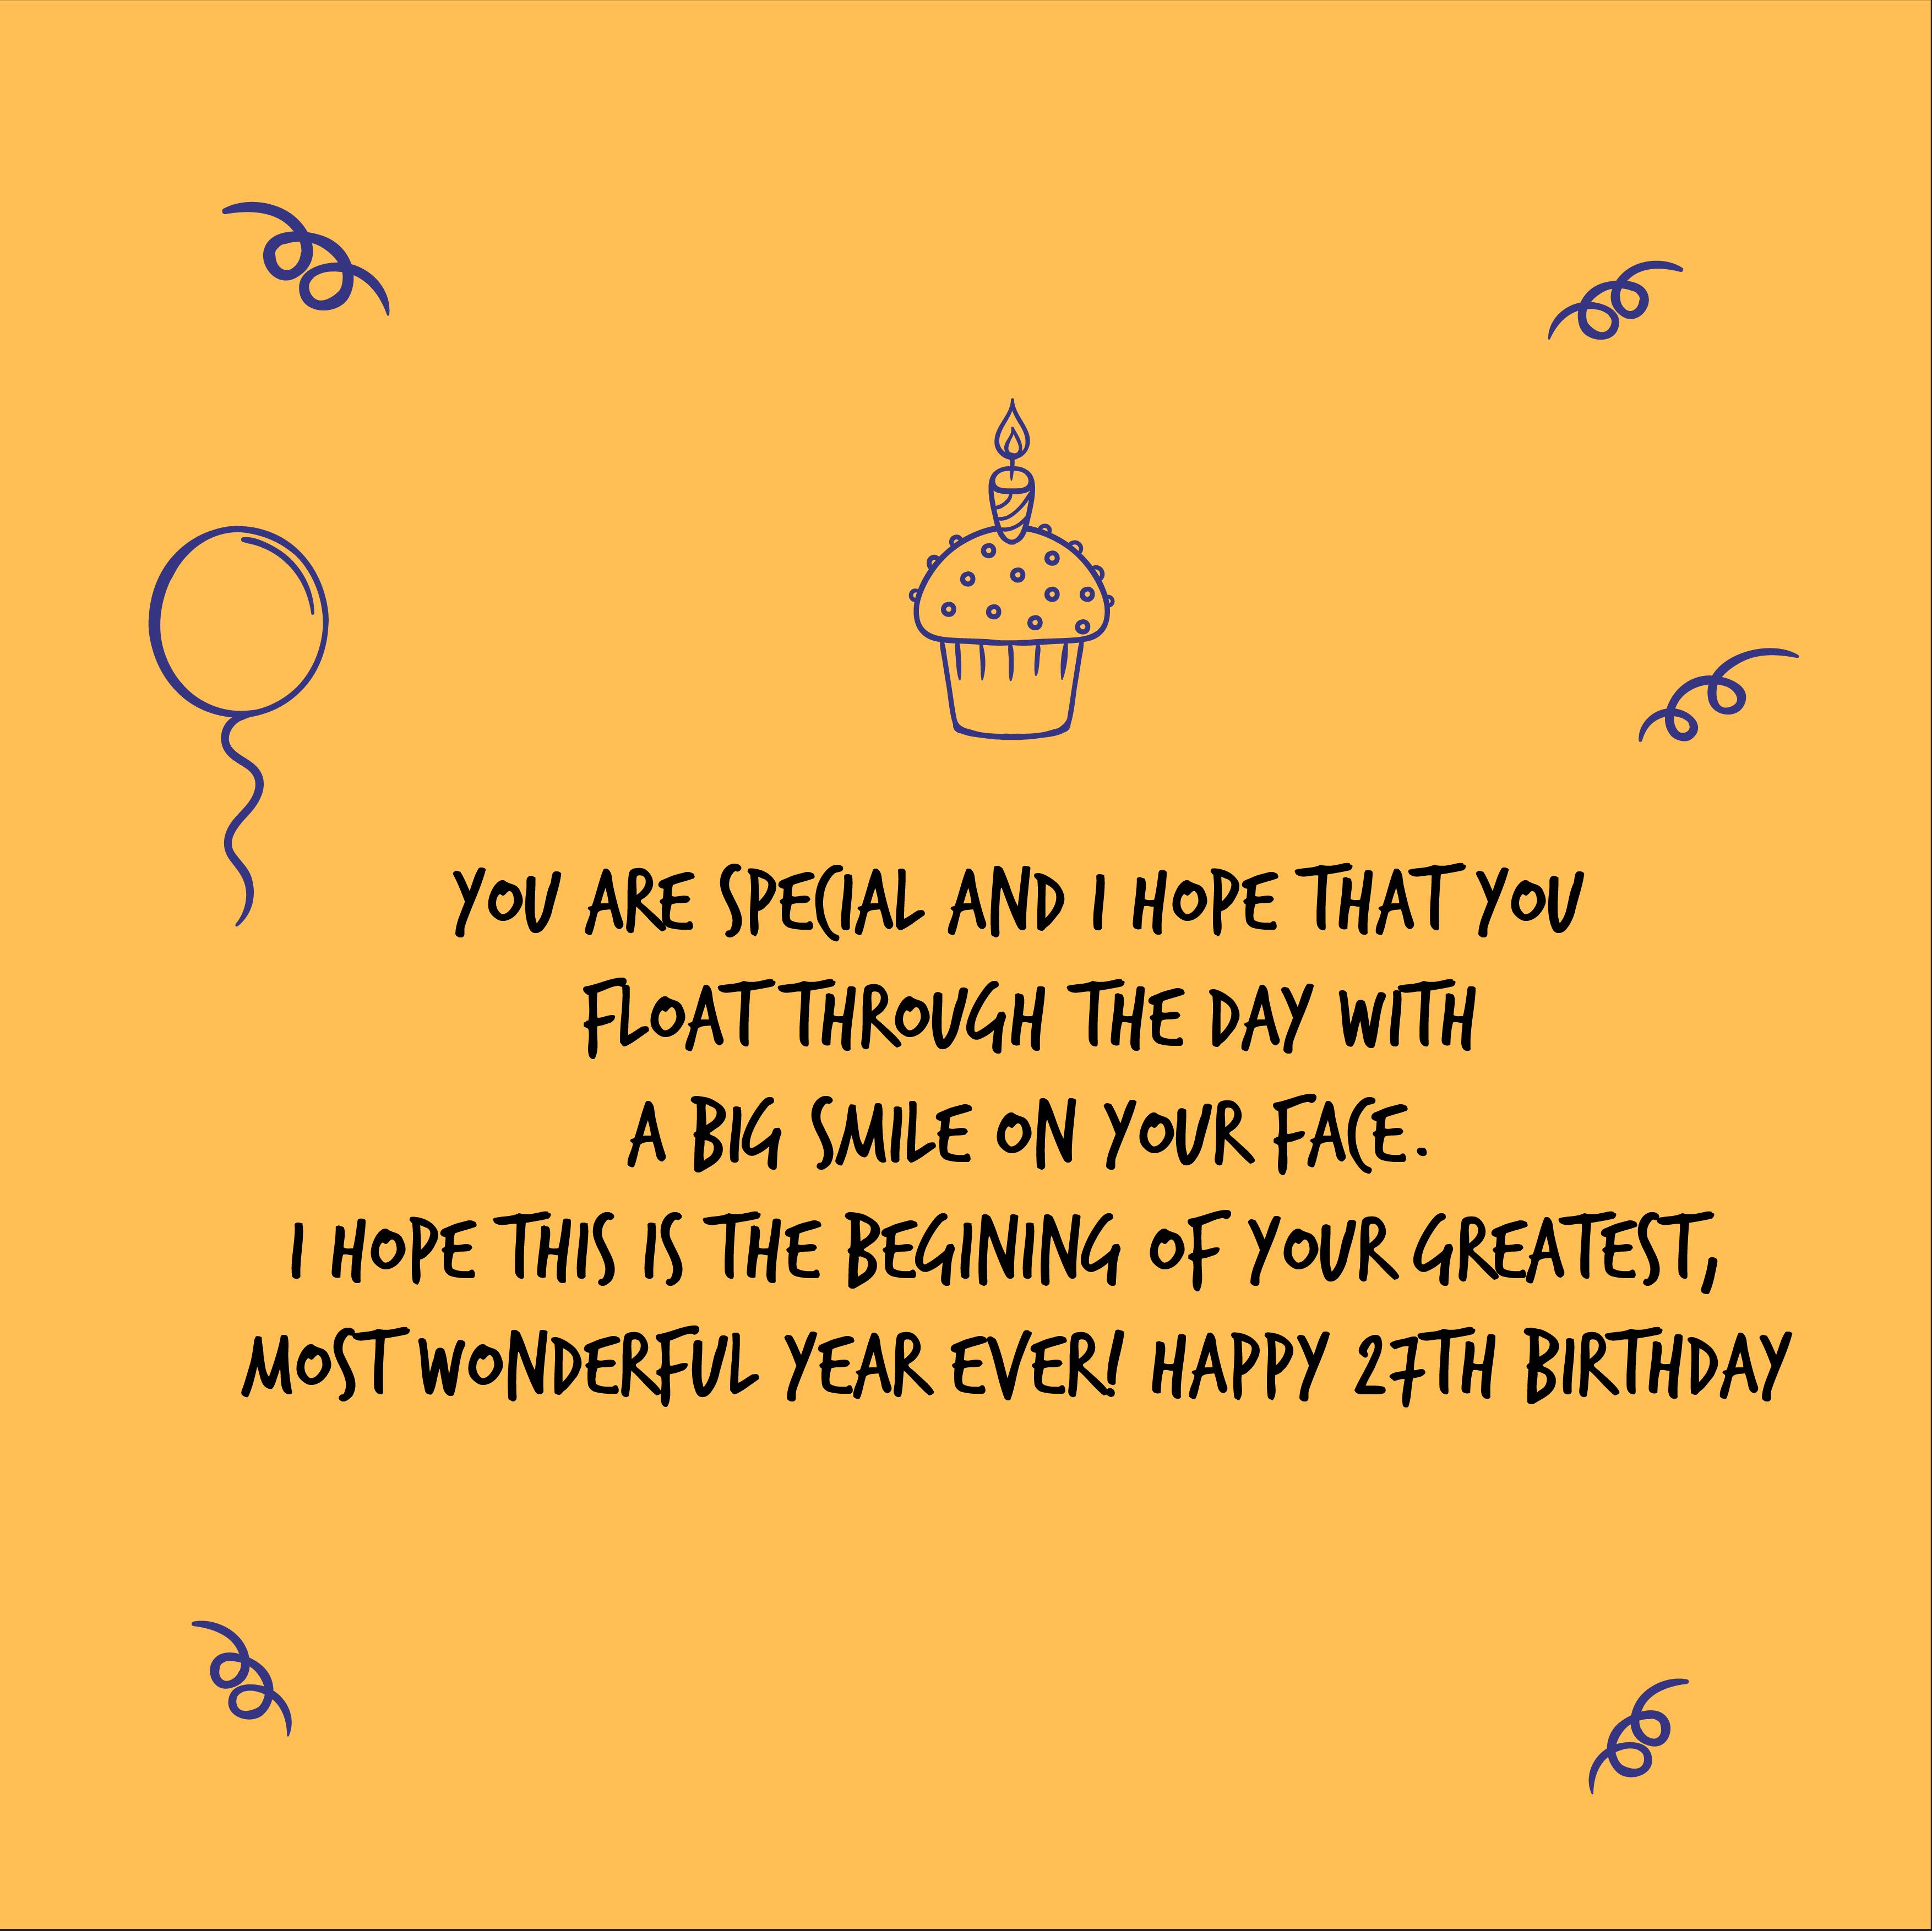 happy-27th-birthday-wishes-08